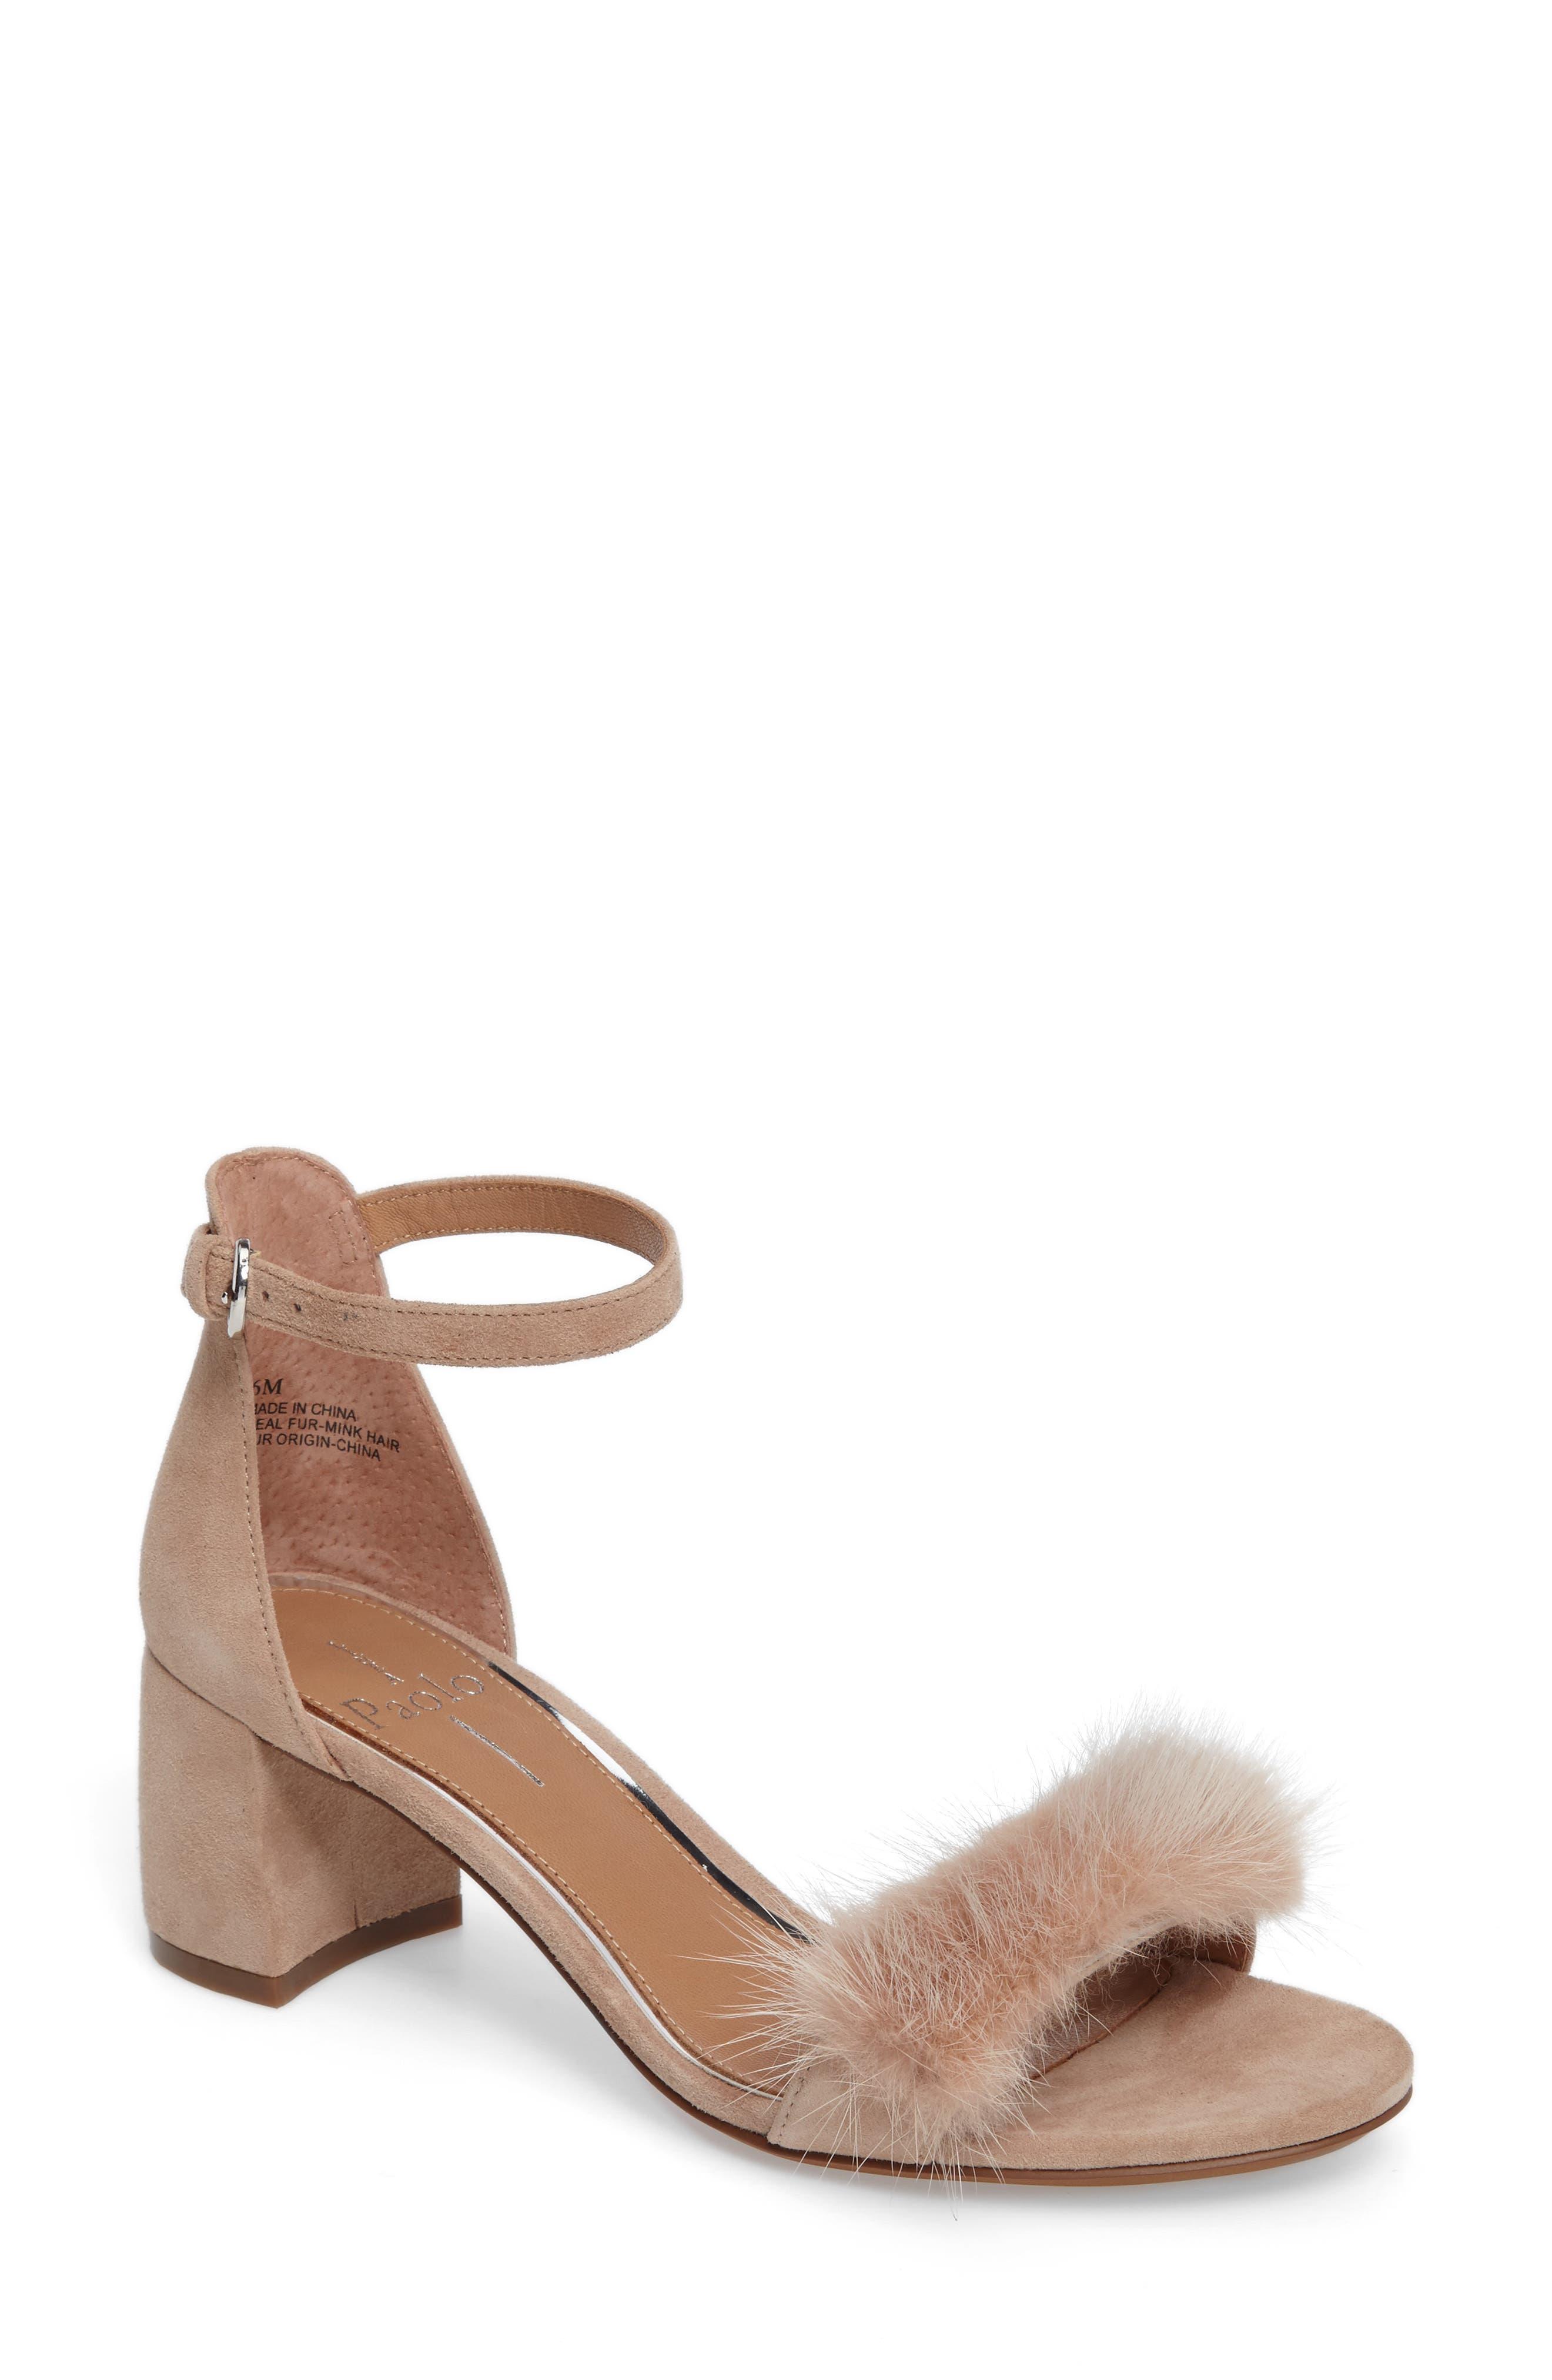 Hepburn Genuine Mink Fur Sandal,                         Main,                         color, Dusty Rose Suede